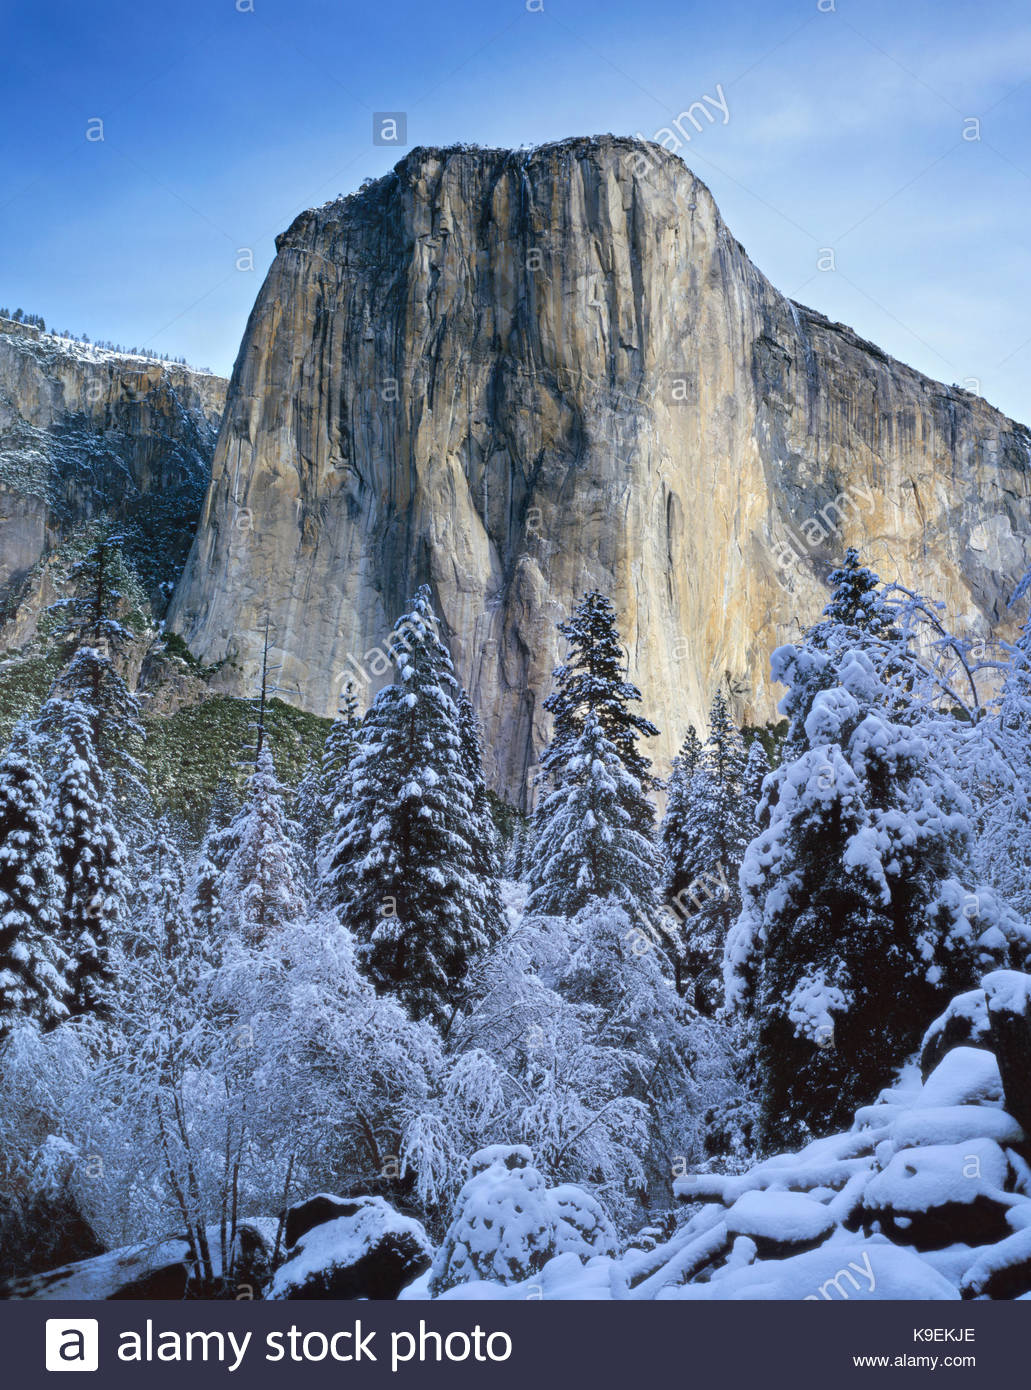 El Capitan Seen through Forest Clearing, Yosemite National Park, California - Stock Image